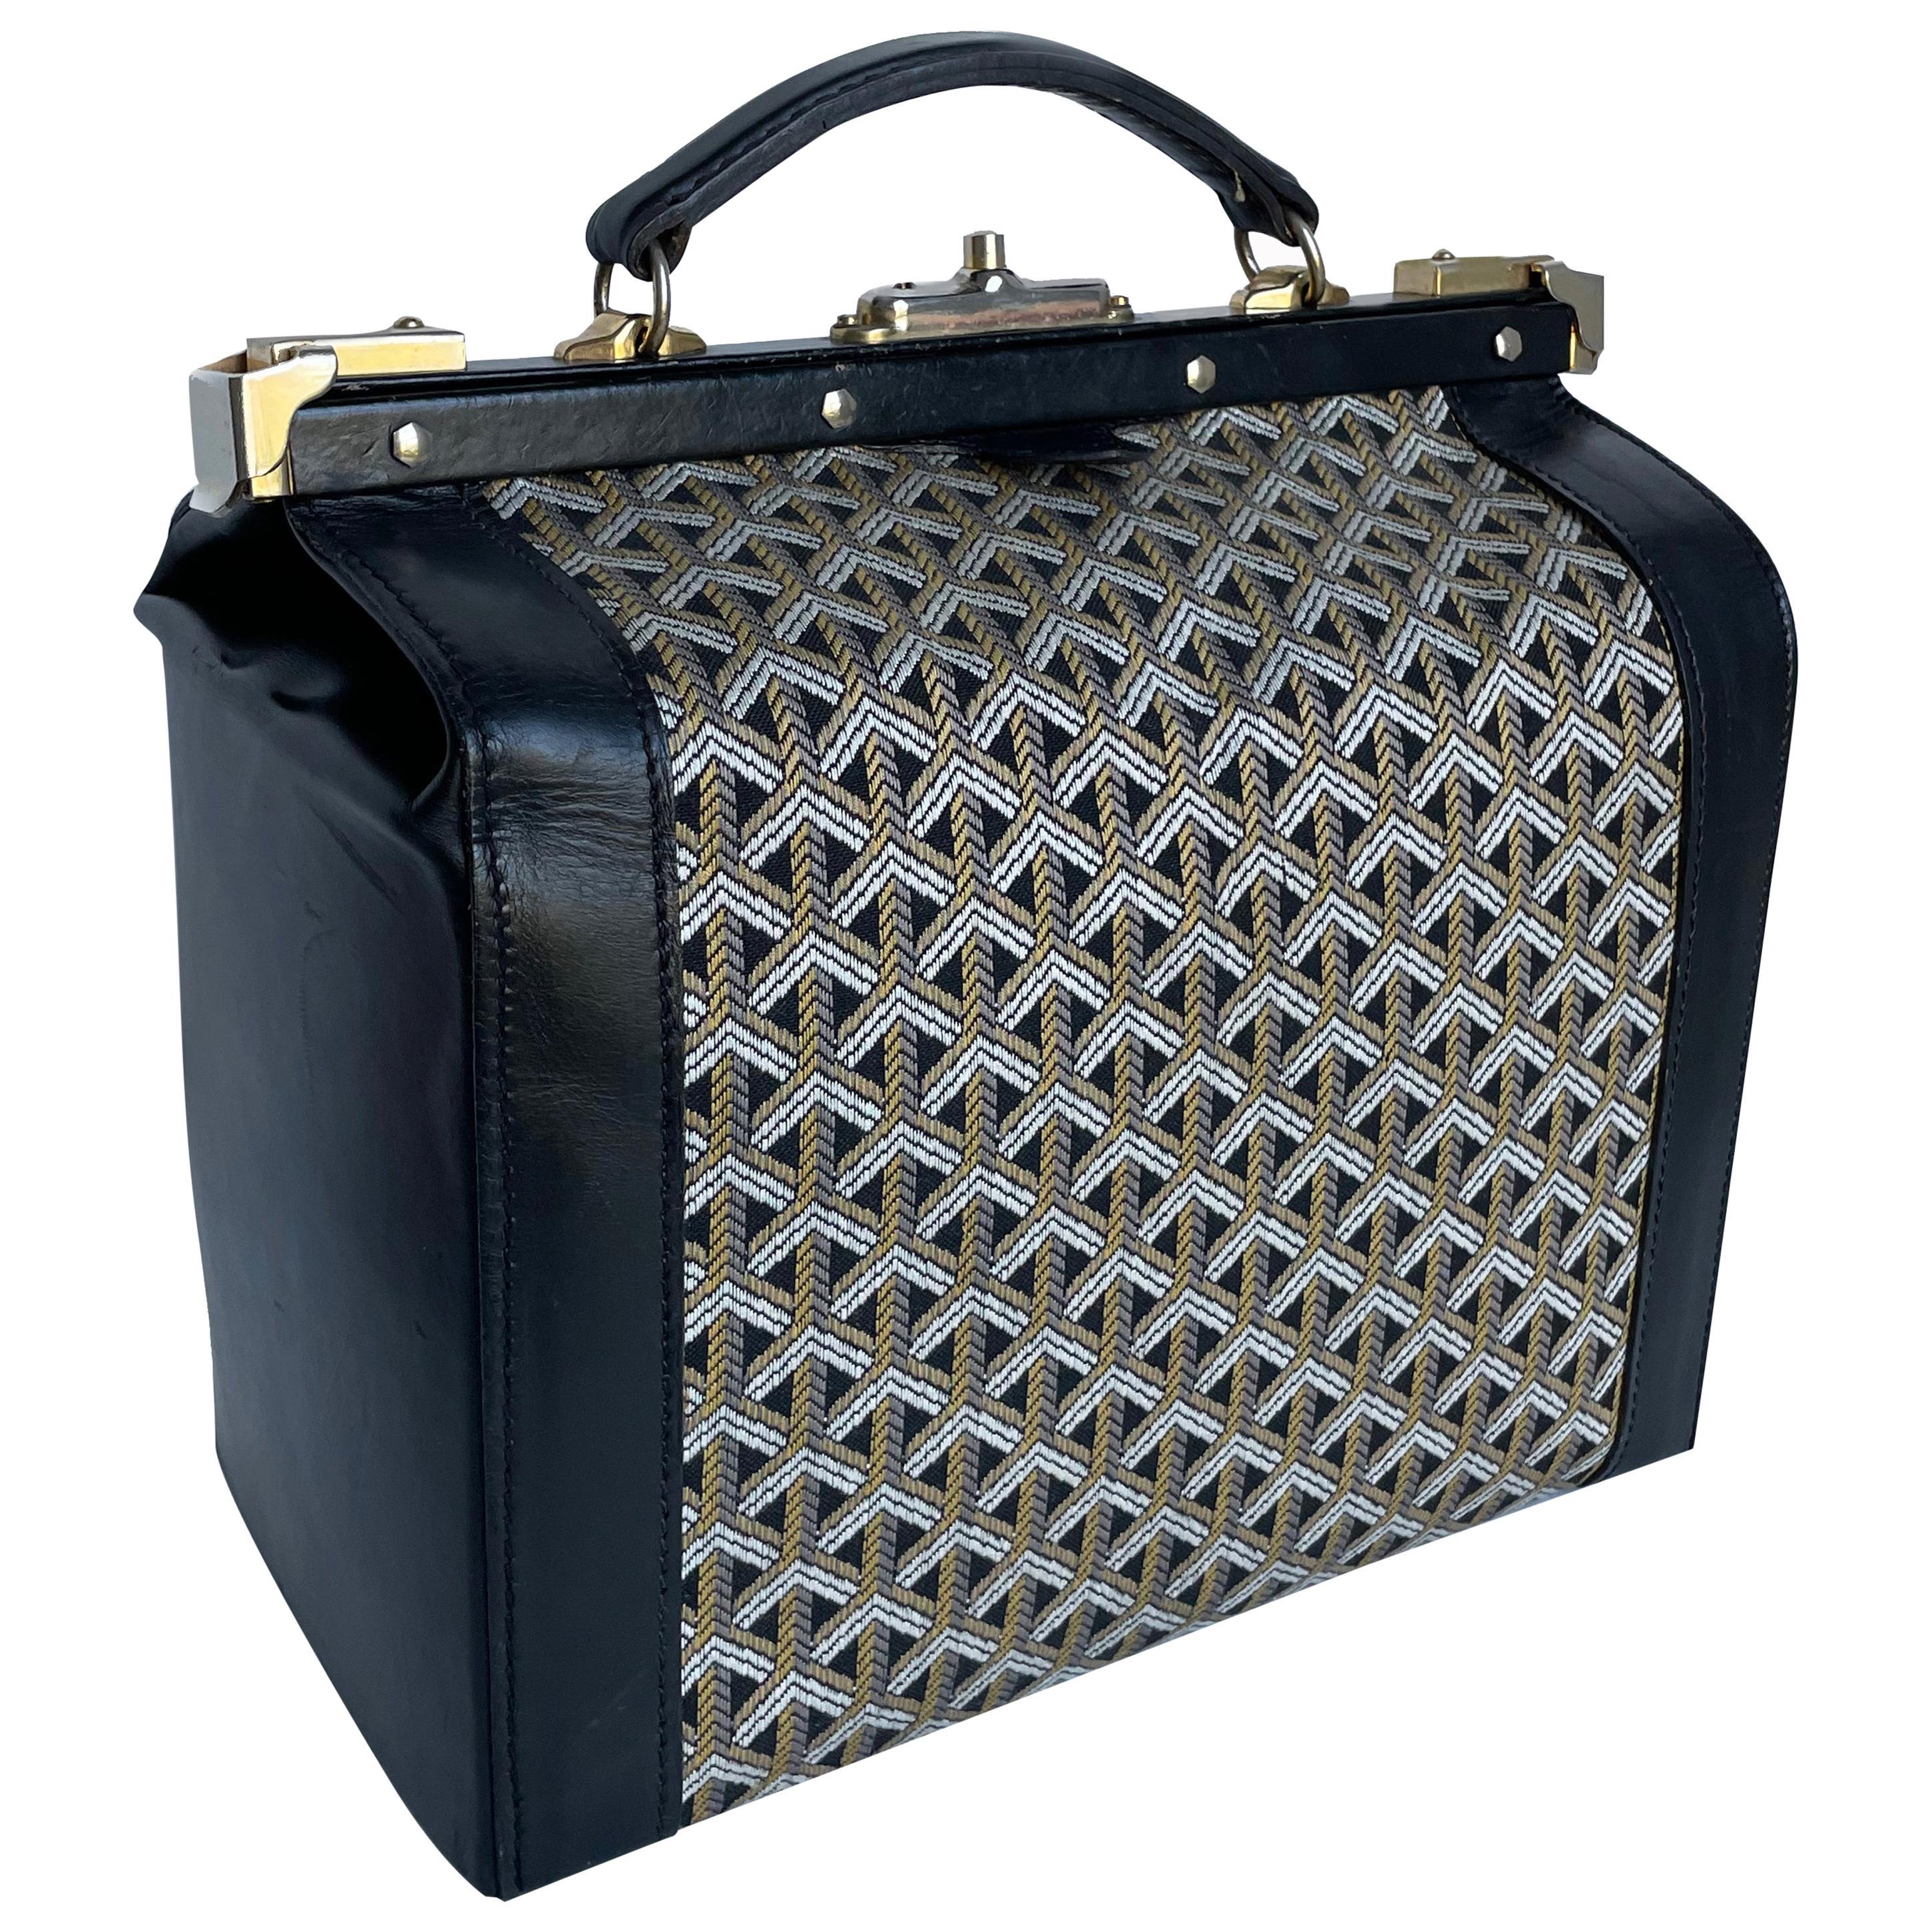 Vintage Goyard Train Case Vanity Gladstone Bag Travel Carry On 1950s Rare